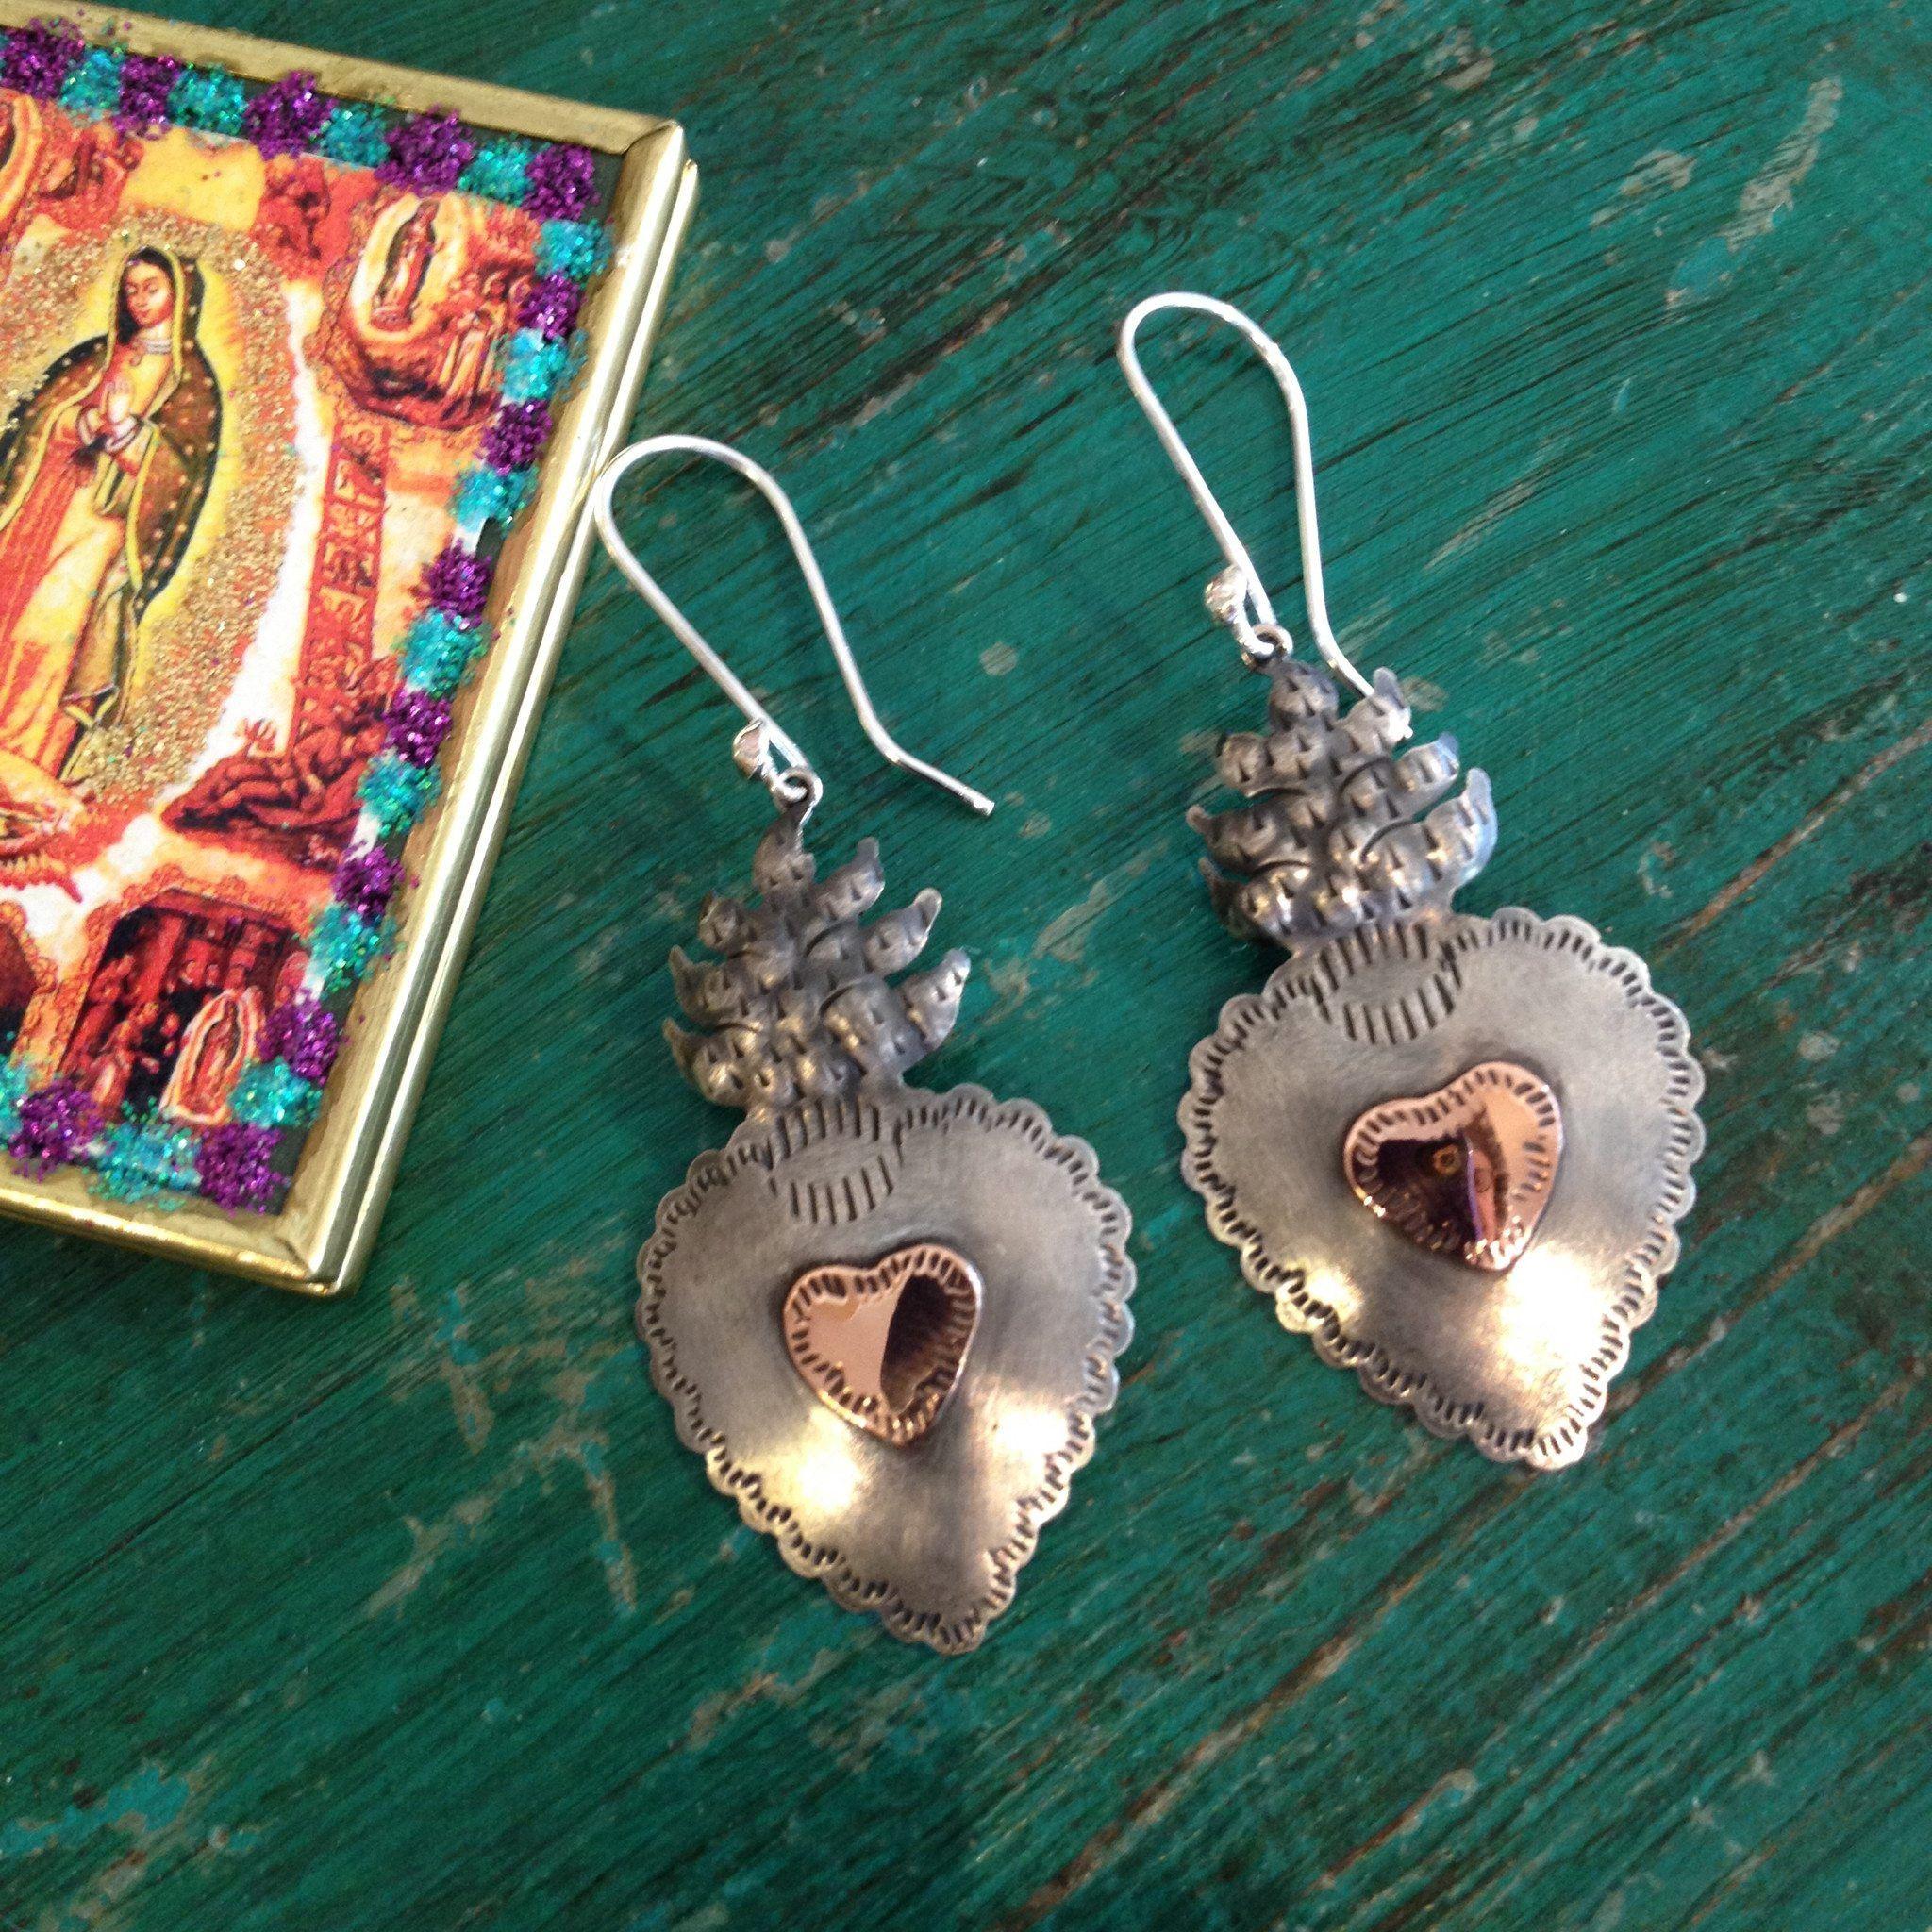 d0a073d1c Zinnia Folk Arts - Copper and Silver Sacred Heart Earrings, Oxidized Silver